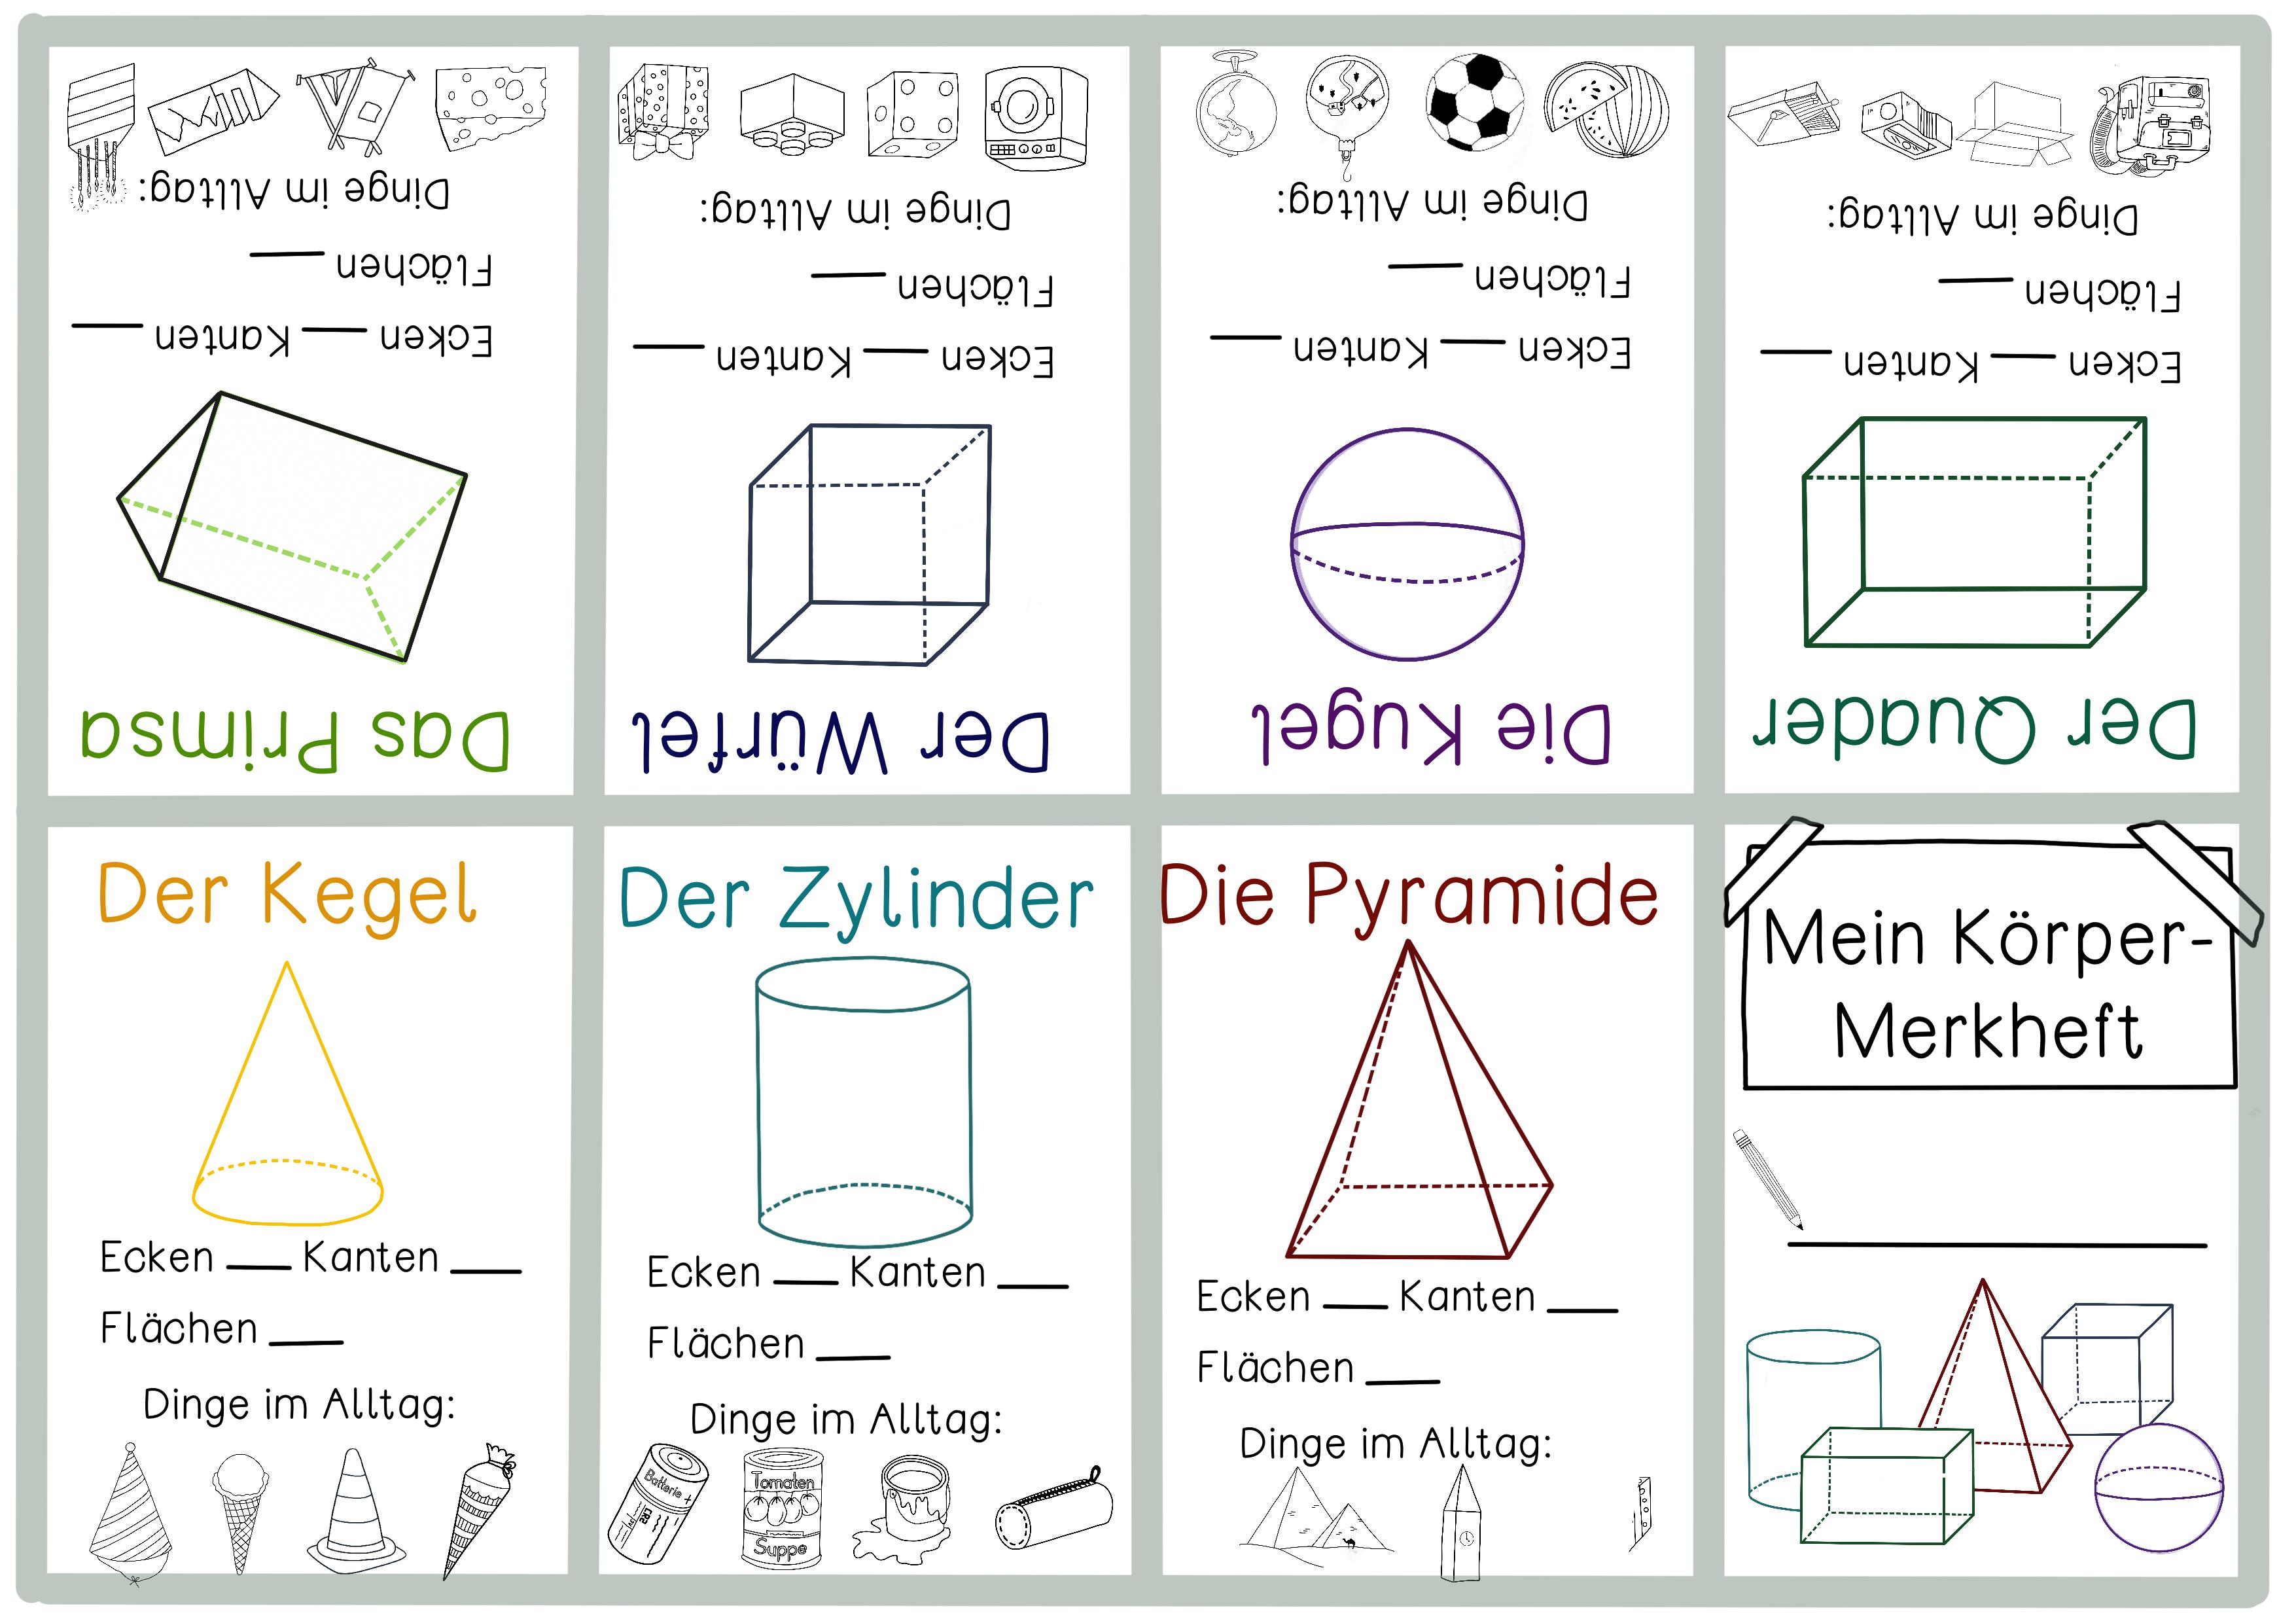 Geometrische Korper Merkheft Zum Falten Korper Zuordnen Mit Bastelanleitung Unterrichtsmaterial Geometrische Korper Geometrie Korper Unterrichtsmaterial